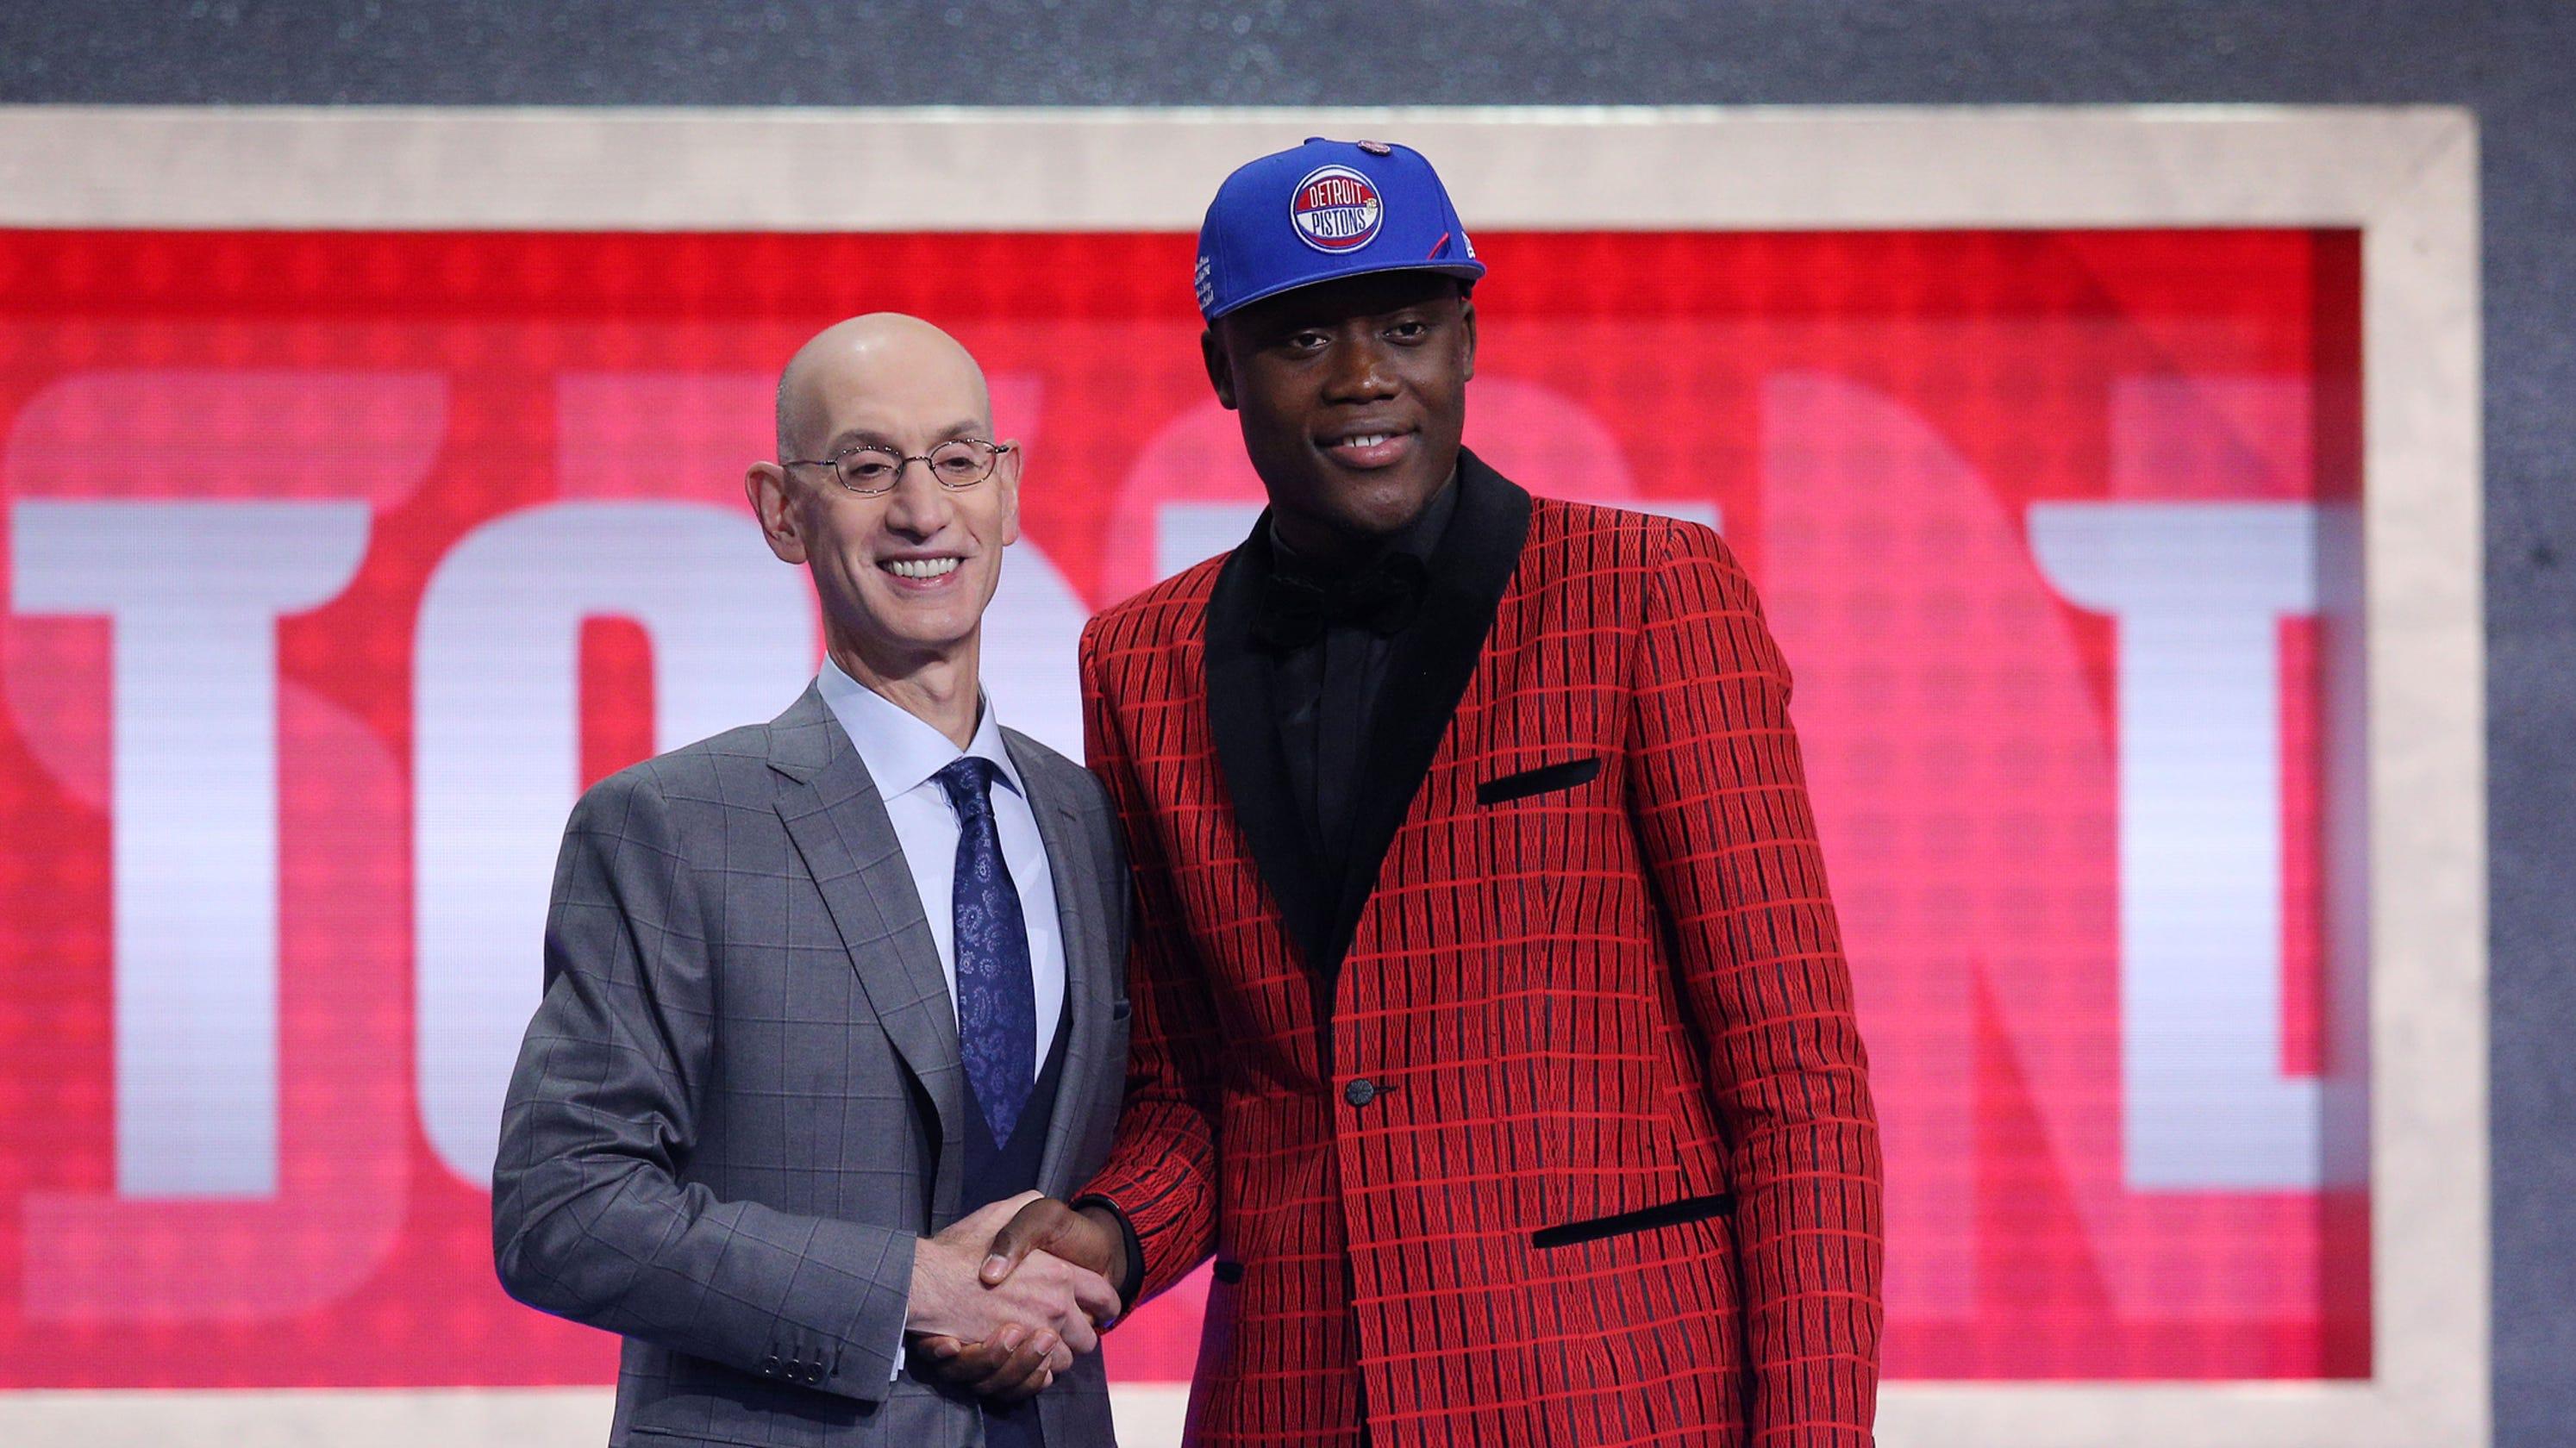 Detroit Pistons pick Sekou Doumbouya at No  15 in NBA draft